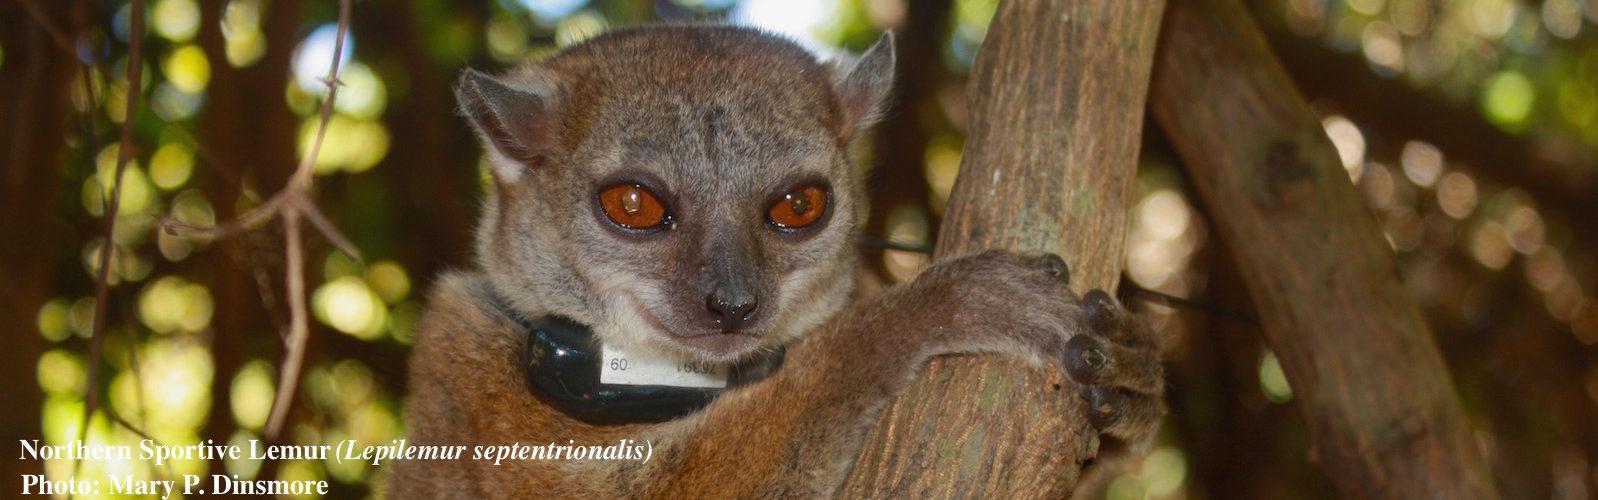 Northern Sportive Lemur resting